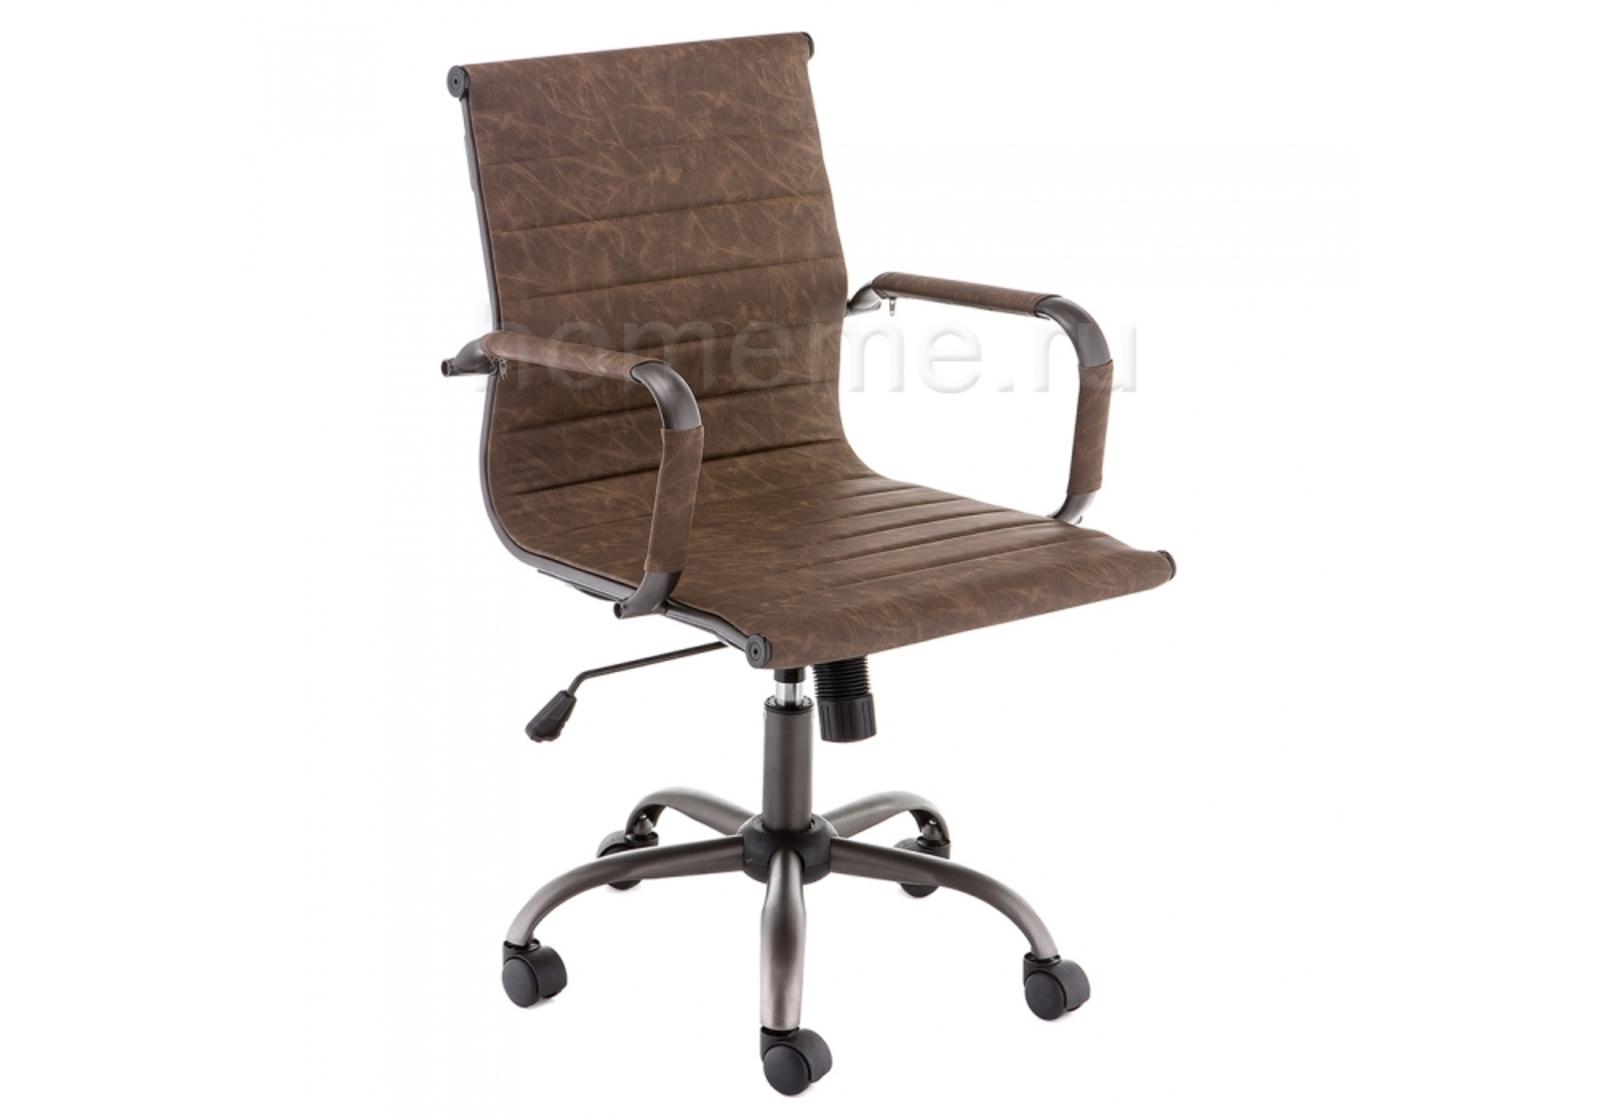 Кресло для офиса HomeMe Harm coffee 11270 от Homeme.ru